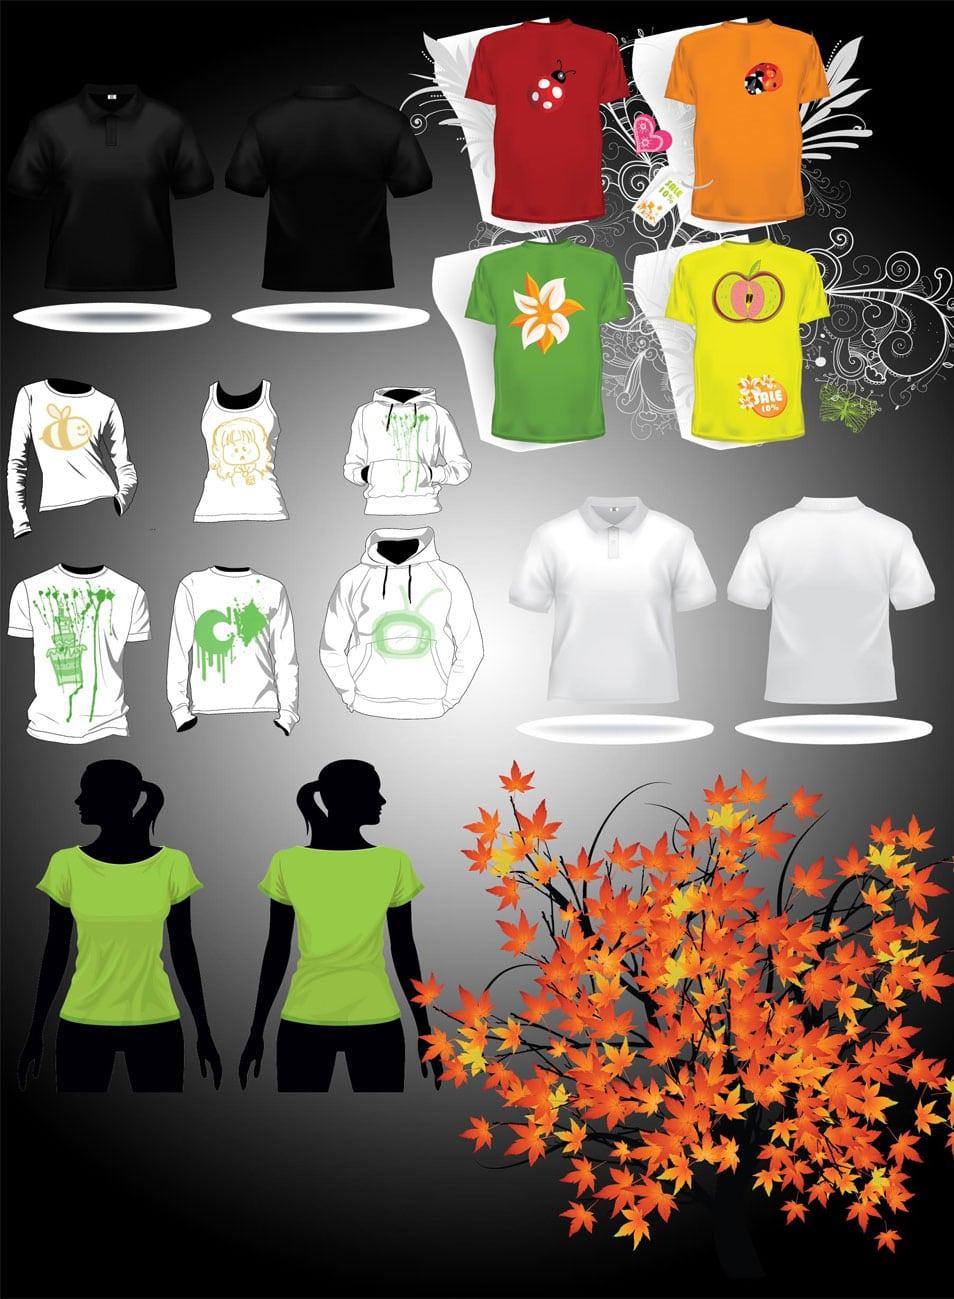 Tshirt collection